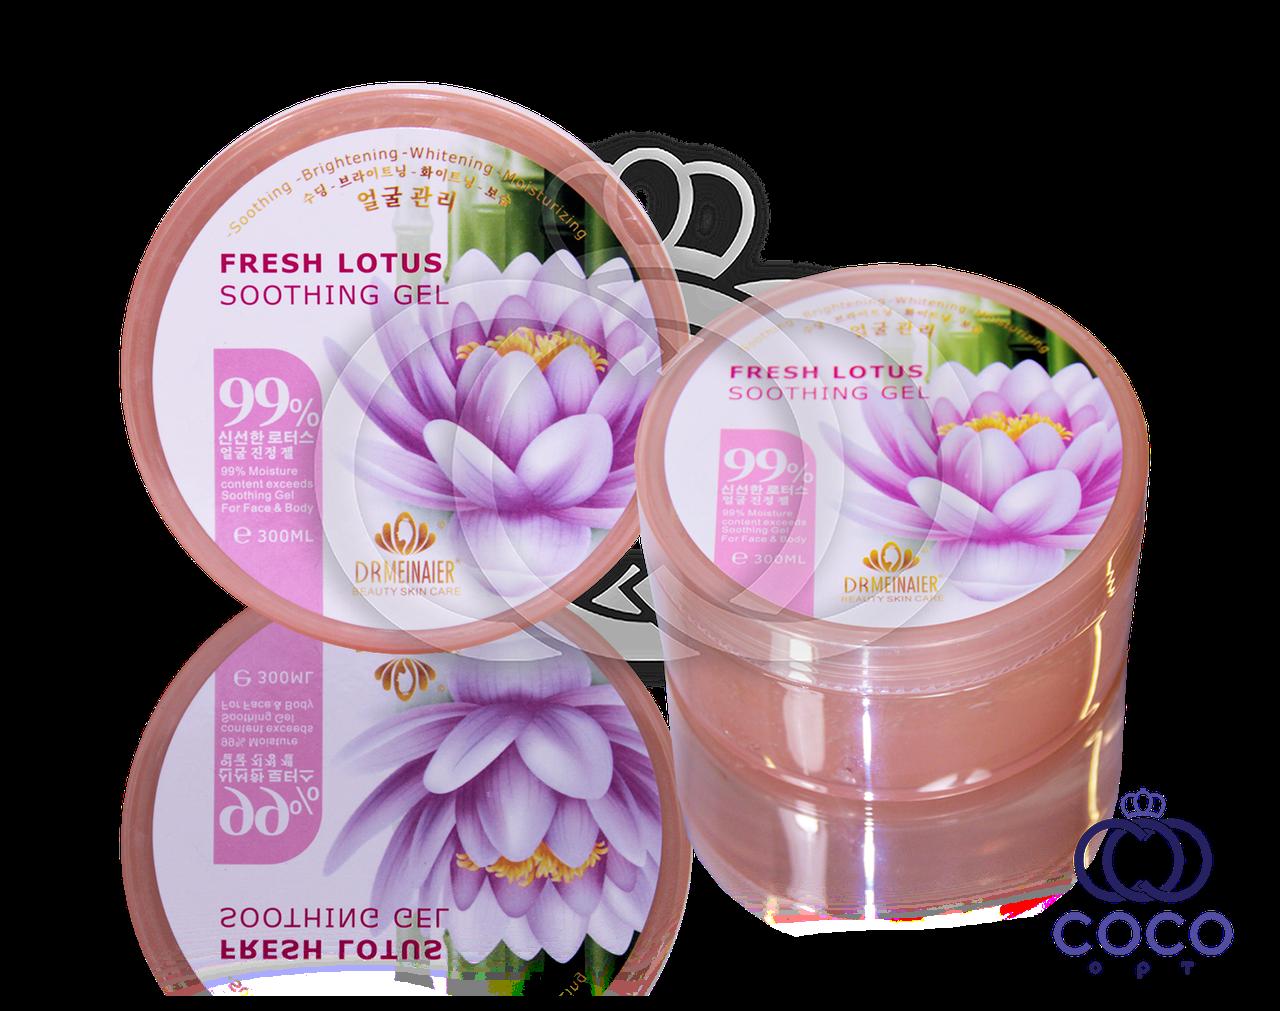 Гель для обличчя і тіла Fresh Lotus Soothing Gel (Свіжість лотоса)